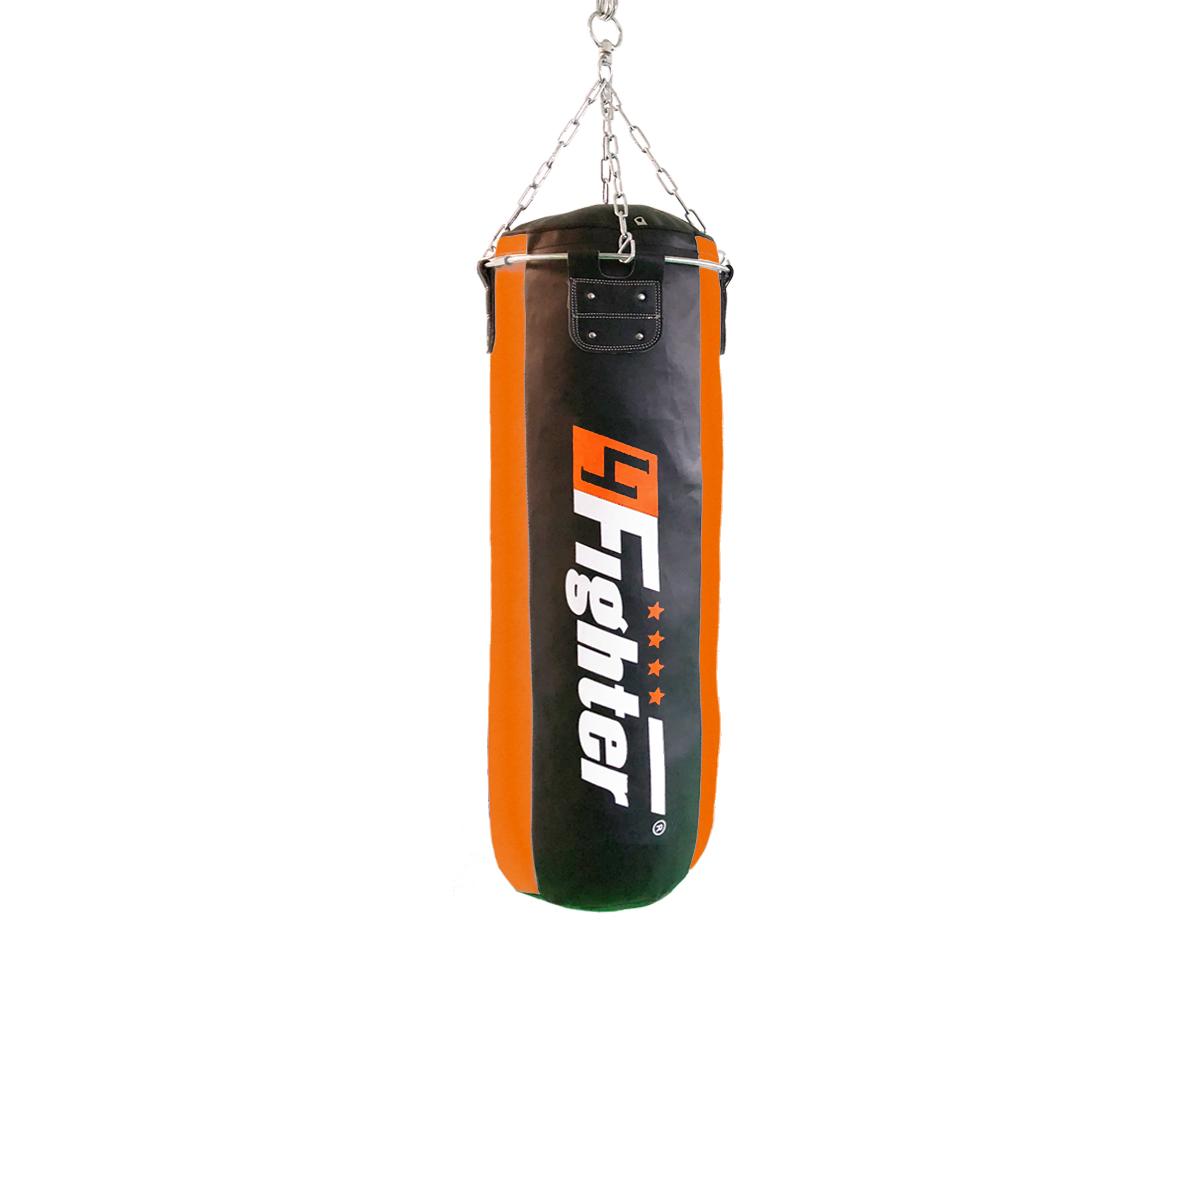 4Fighter Profi Kunstleder Boxsack / Sandsack - schwarz/orange, gefüllt 100cm